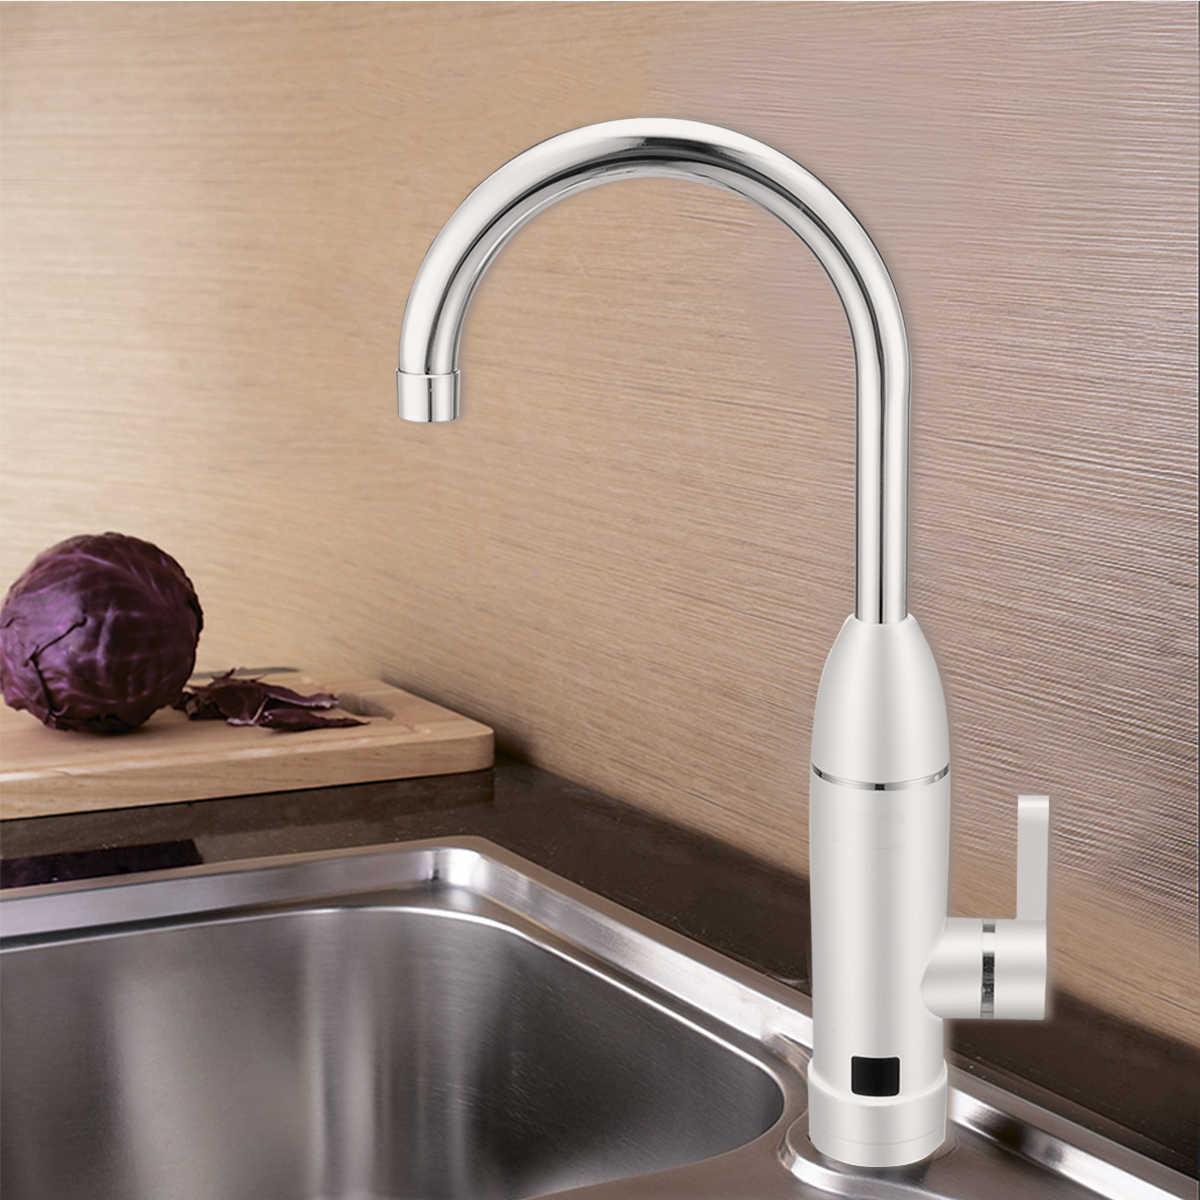 1pc אופנה חשמלי מיידי ברז + תרסיס צינור ברז דוד חימום ברז מים חיסכון למטבח אמבטיה לשטוף אגן